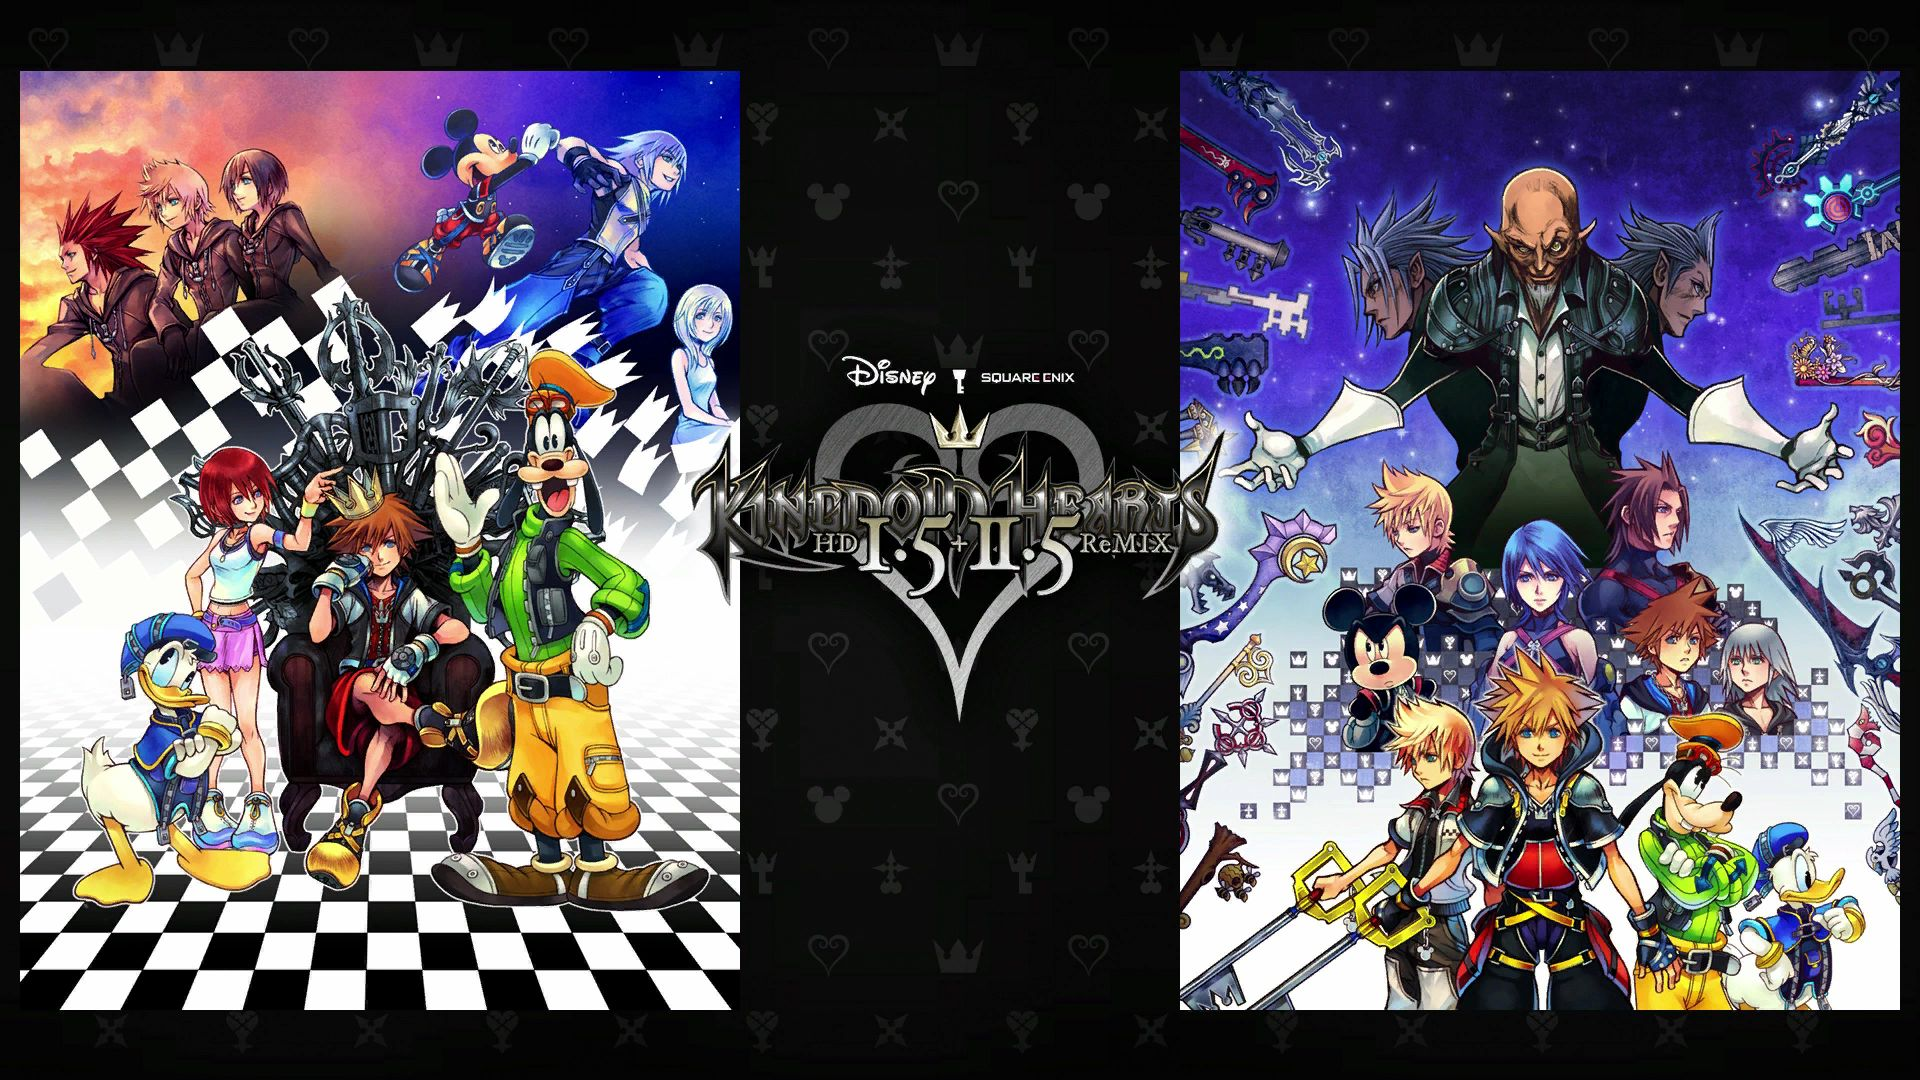 Kingdom Hearts I.5 + II.5 HD ReMIX